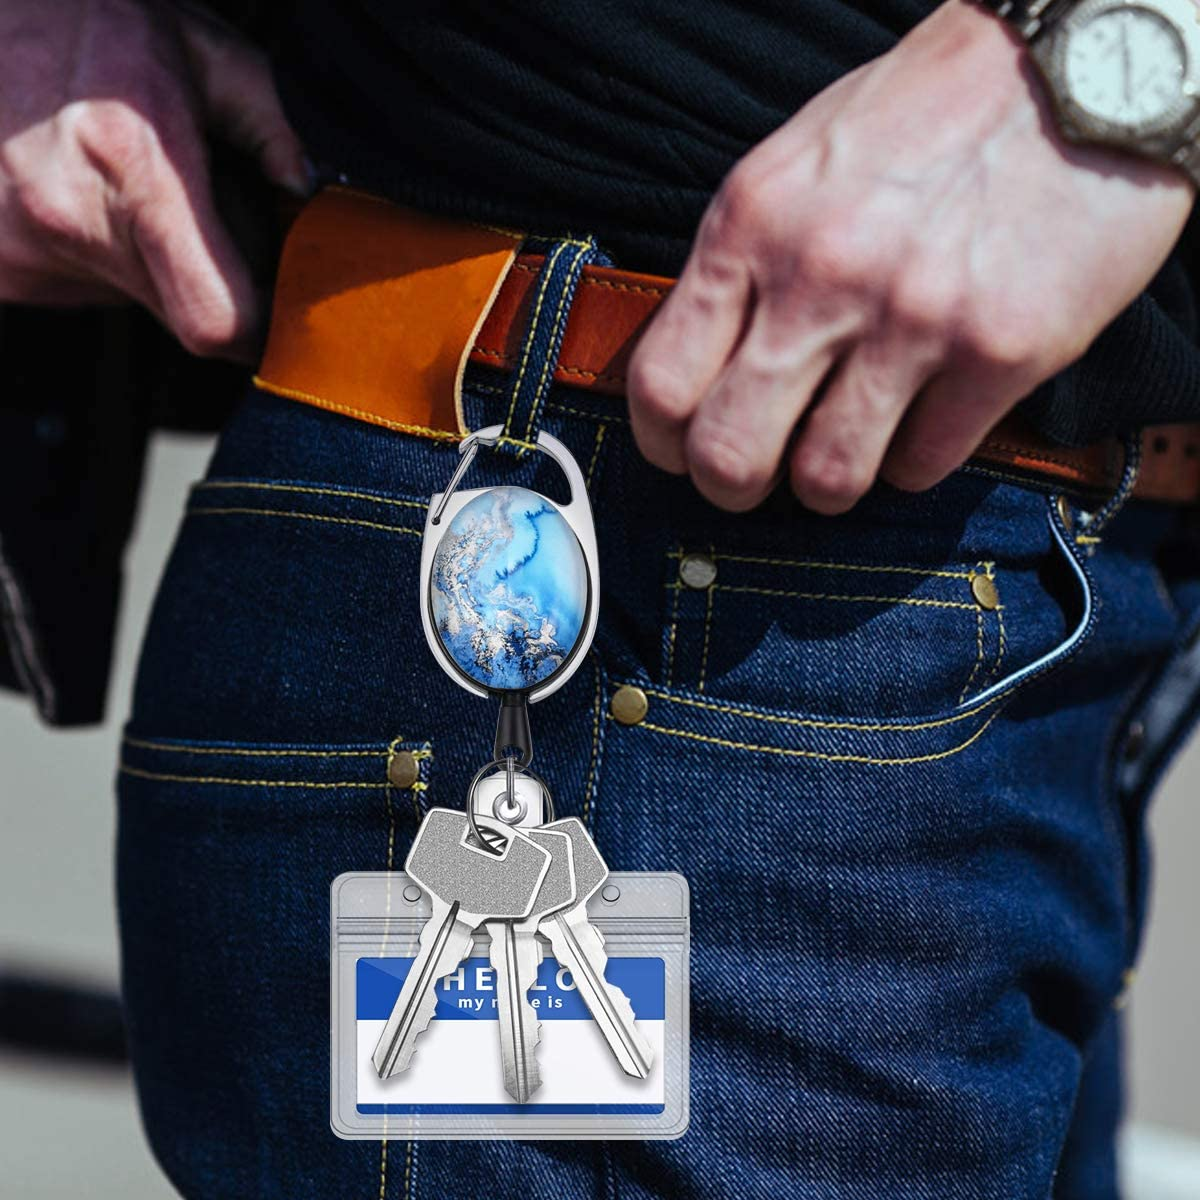 mit Karabiner G/ürtelclip Schl/üsselring 23 Zoll Nylon Rope Shiny Marble Design Hausarbeit Keys Holder Heavy Duty f/ür ID Card Keys Schl/üssel JoJo Fodlon 3pcs Ausweisjojo